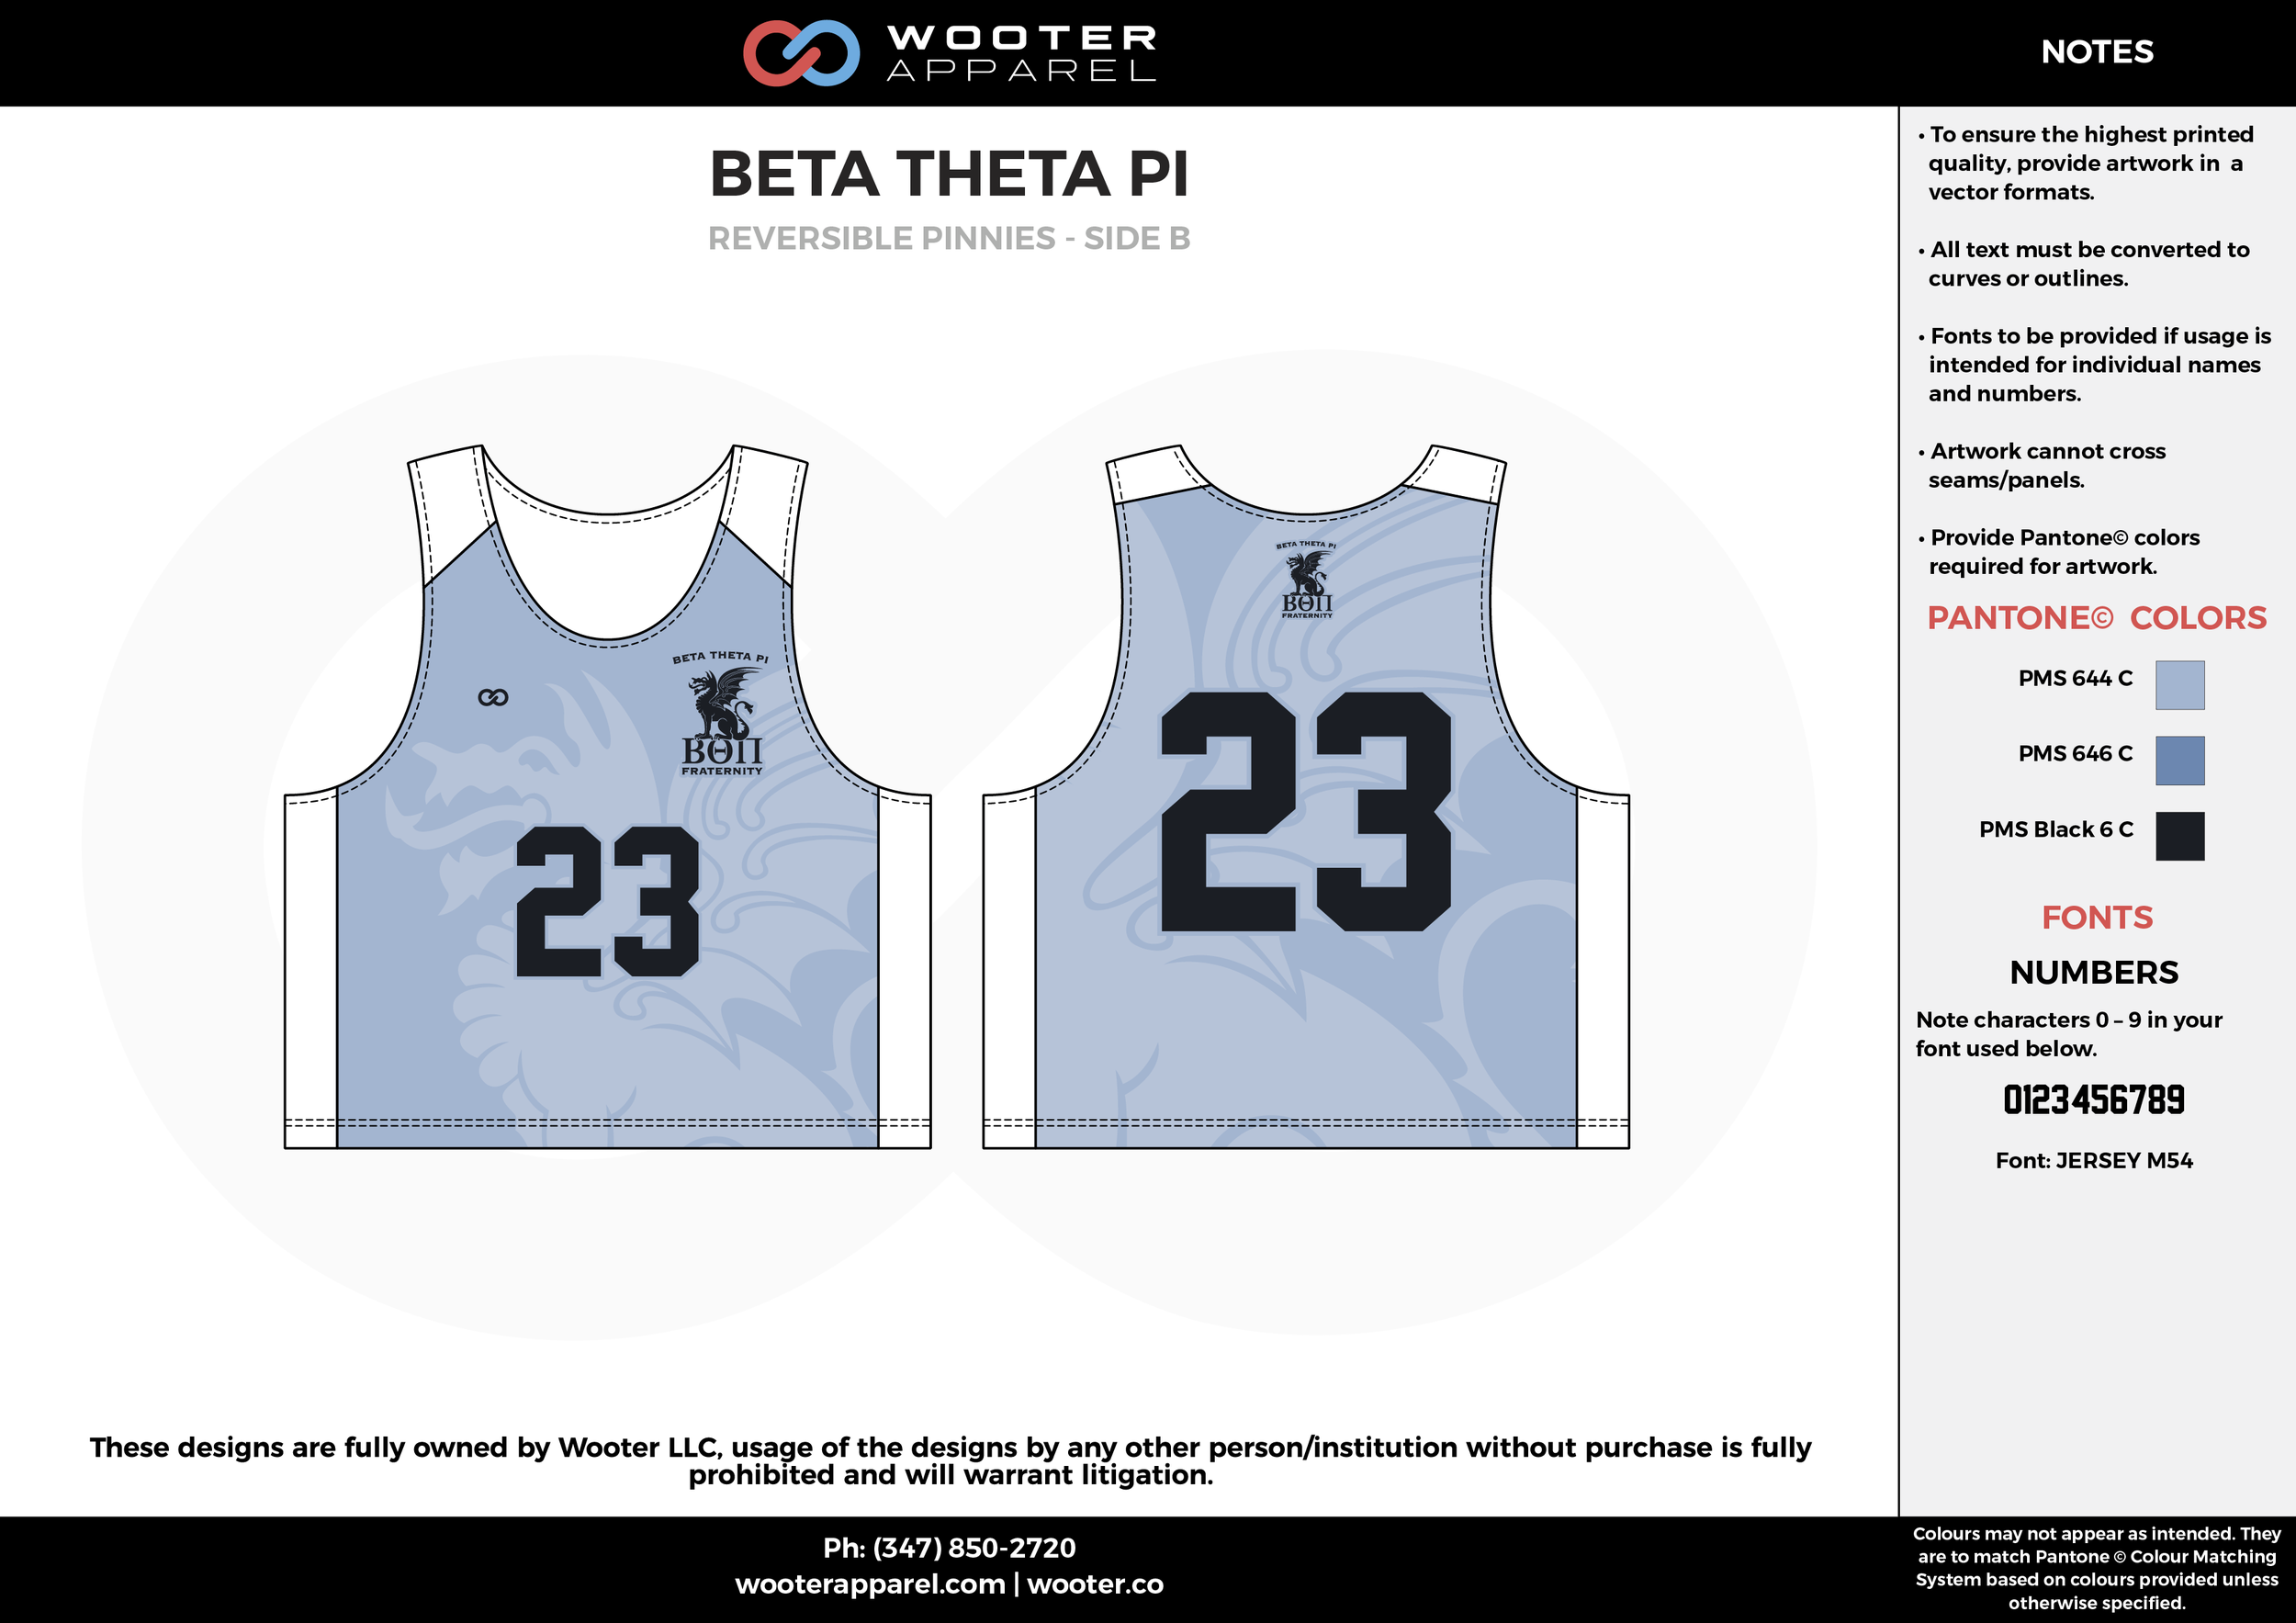 Beta Theta Pi Blue and White Lacrosse Uniforms, Reversible Pinnies, Jerseys,